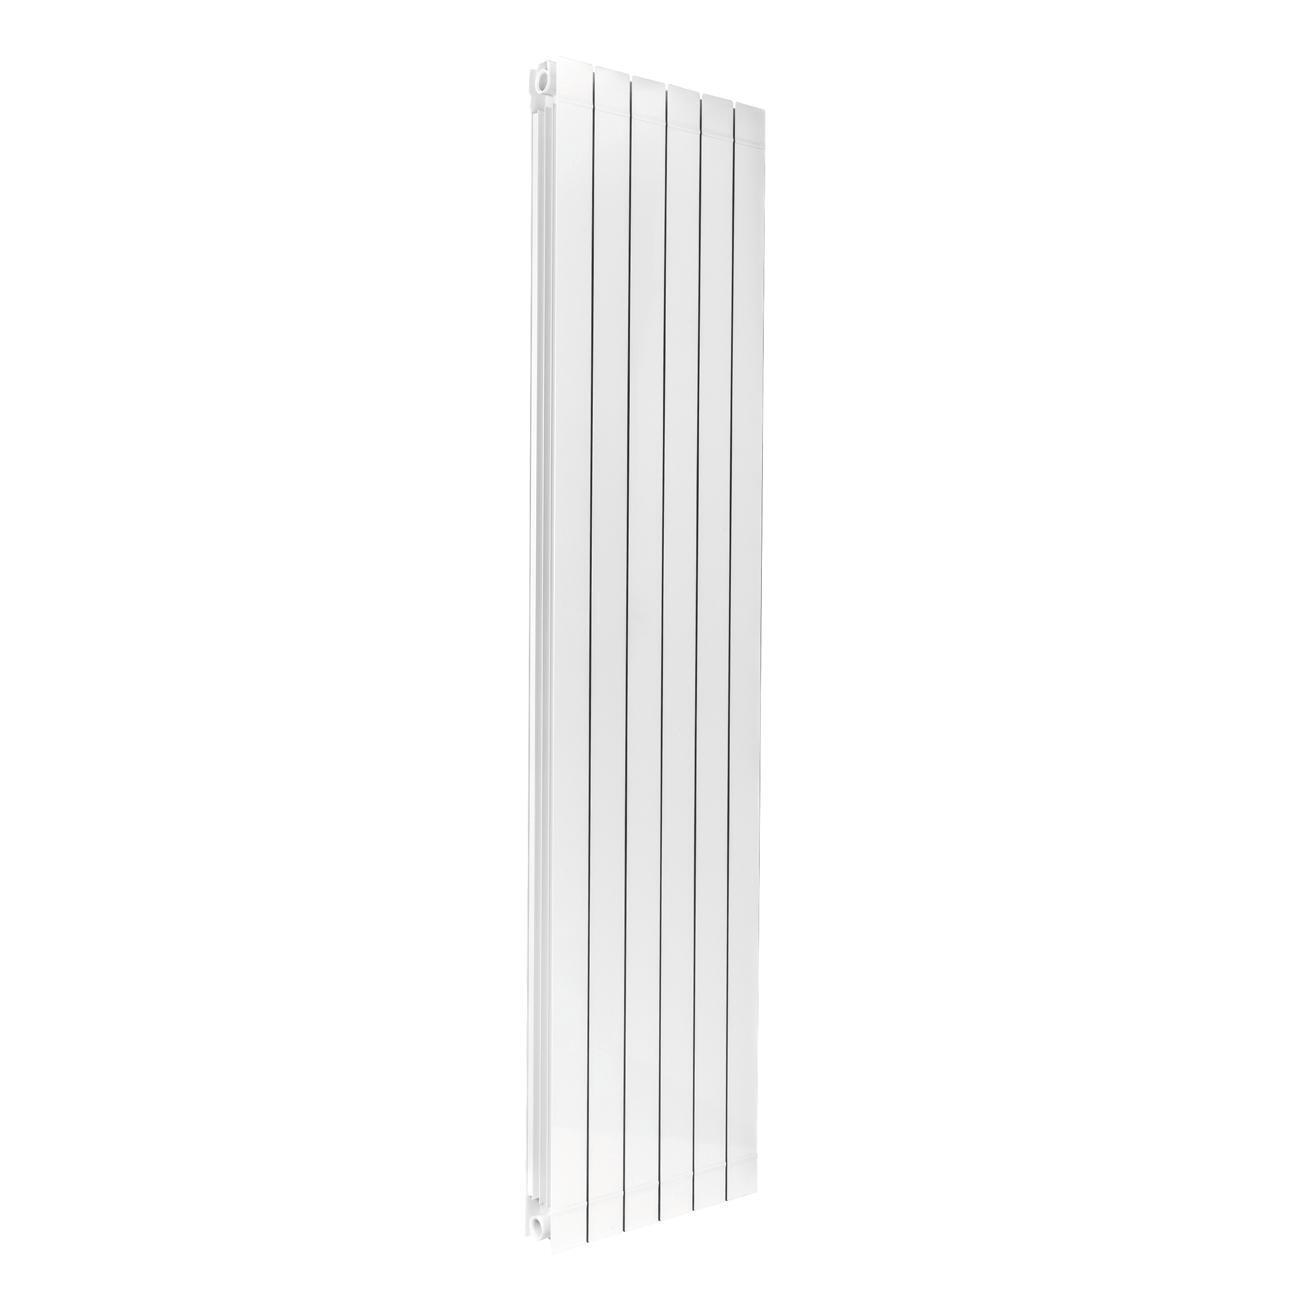 Radiatore acqua calda PRODIGE Superior in alluminio 6 elementi interasse 200 cm - 3